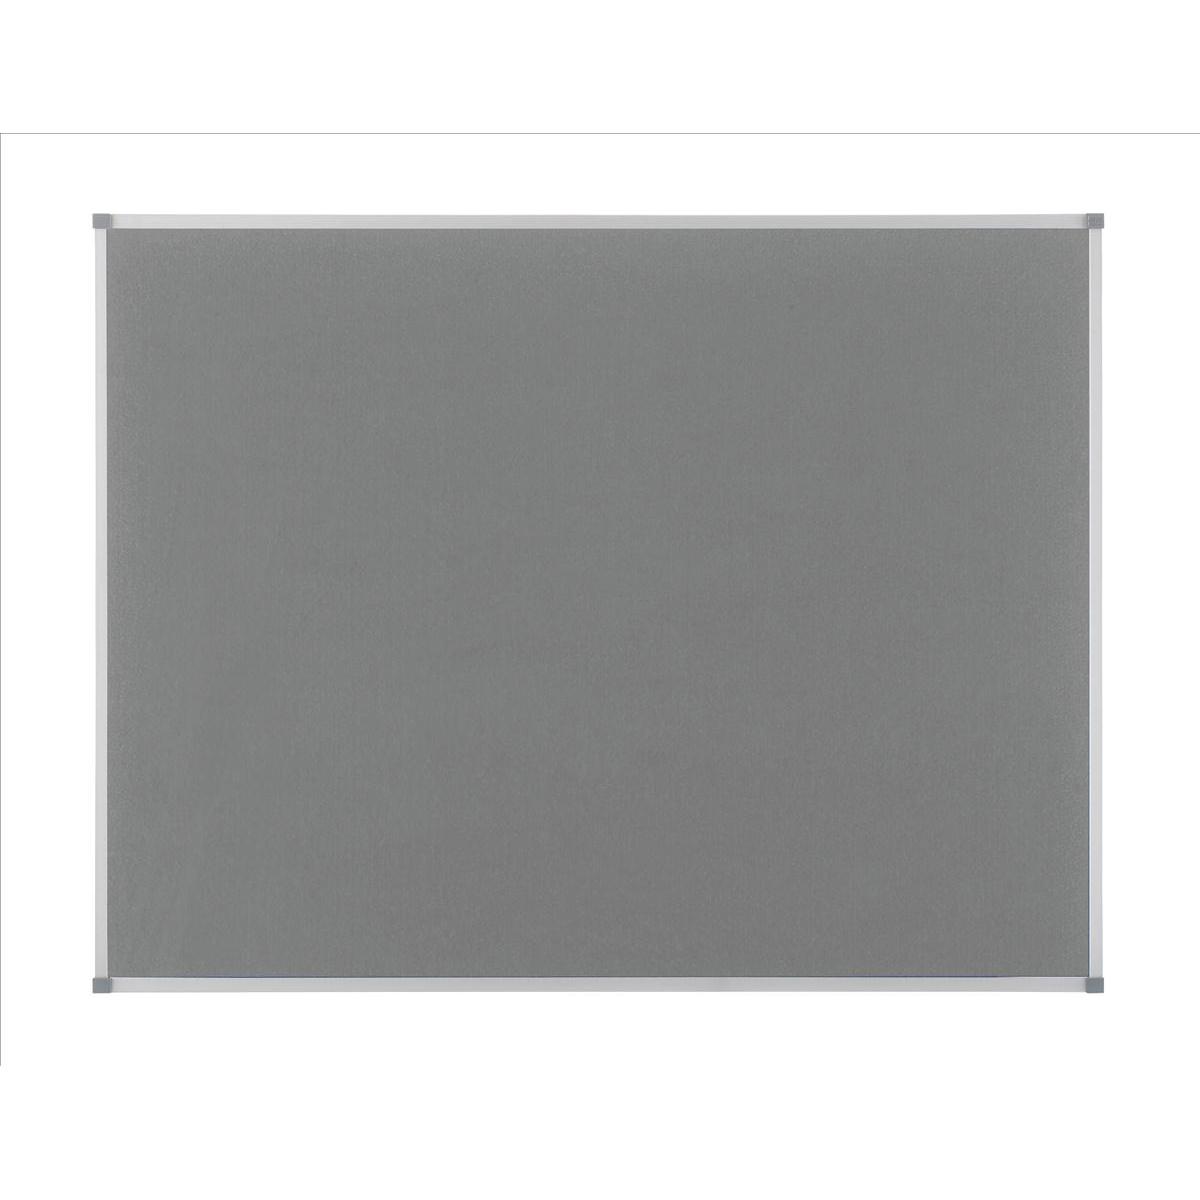 Nobo Classic Noticeboard Felt with Aluminium Frame W900xH600mm Grey Ref 1900911